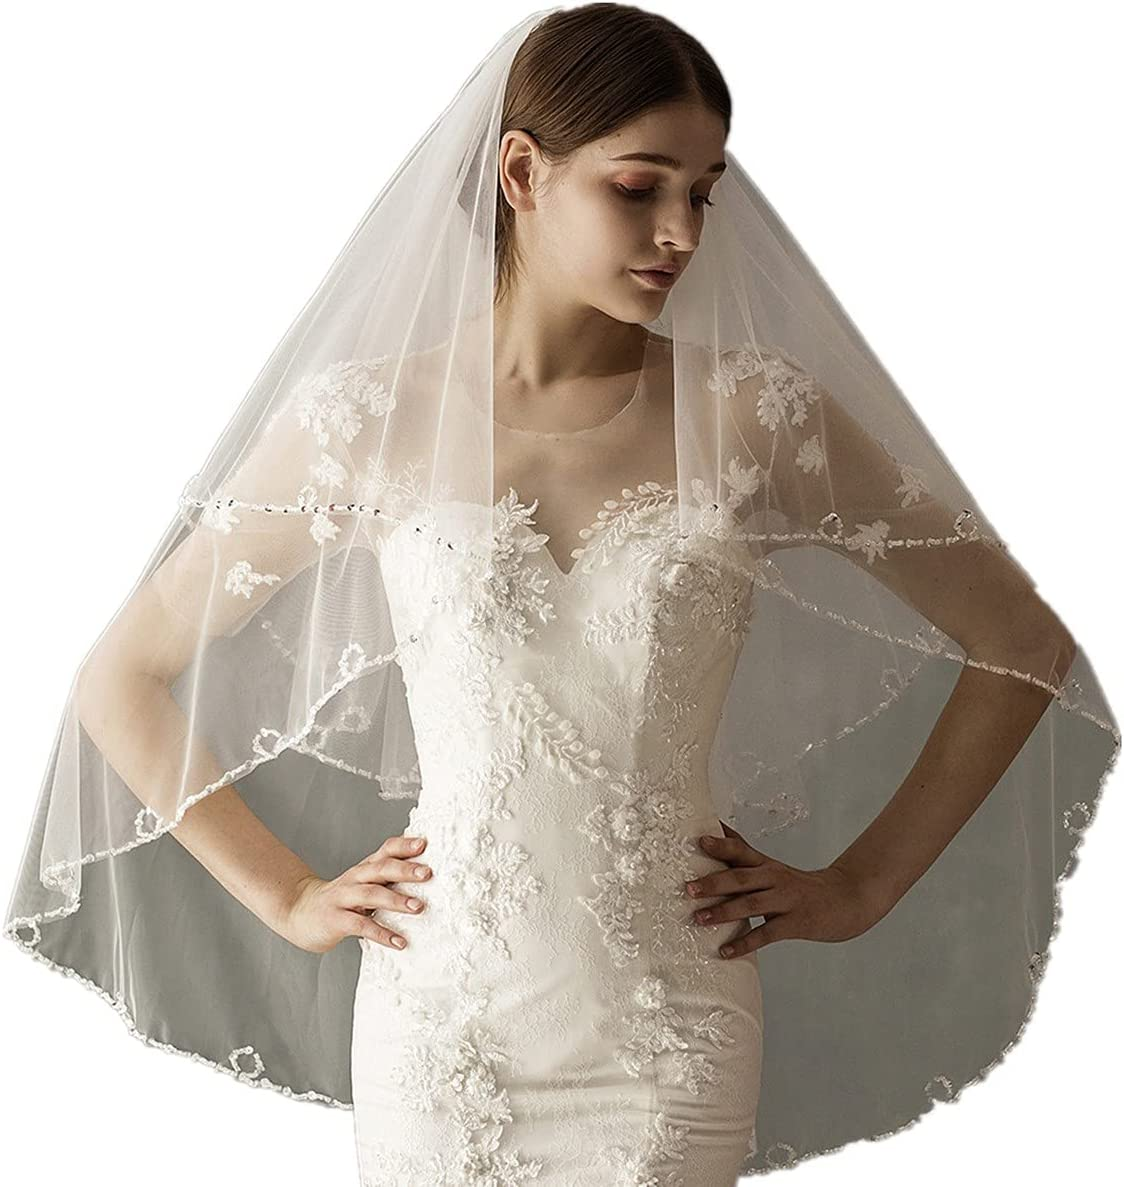 JZJZ Be super welcome Wedding Veil Women's Short 2 Edge Lace Beaded Tul Soft Rapid rise Tier